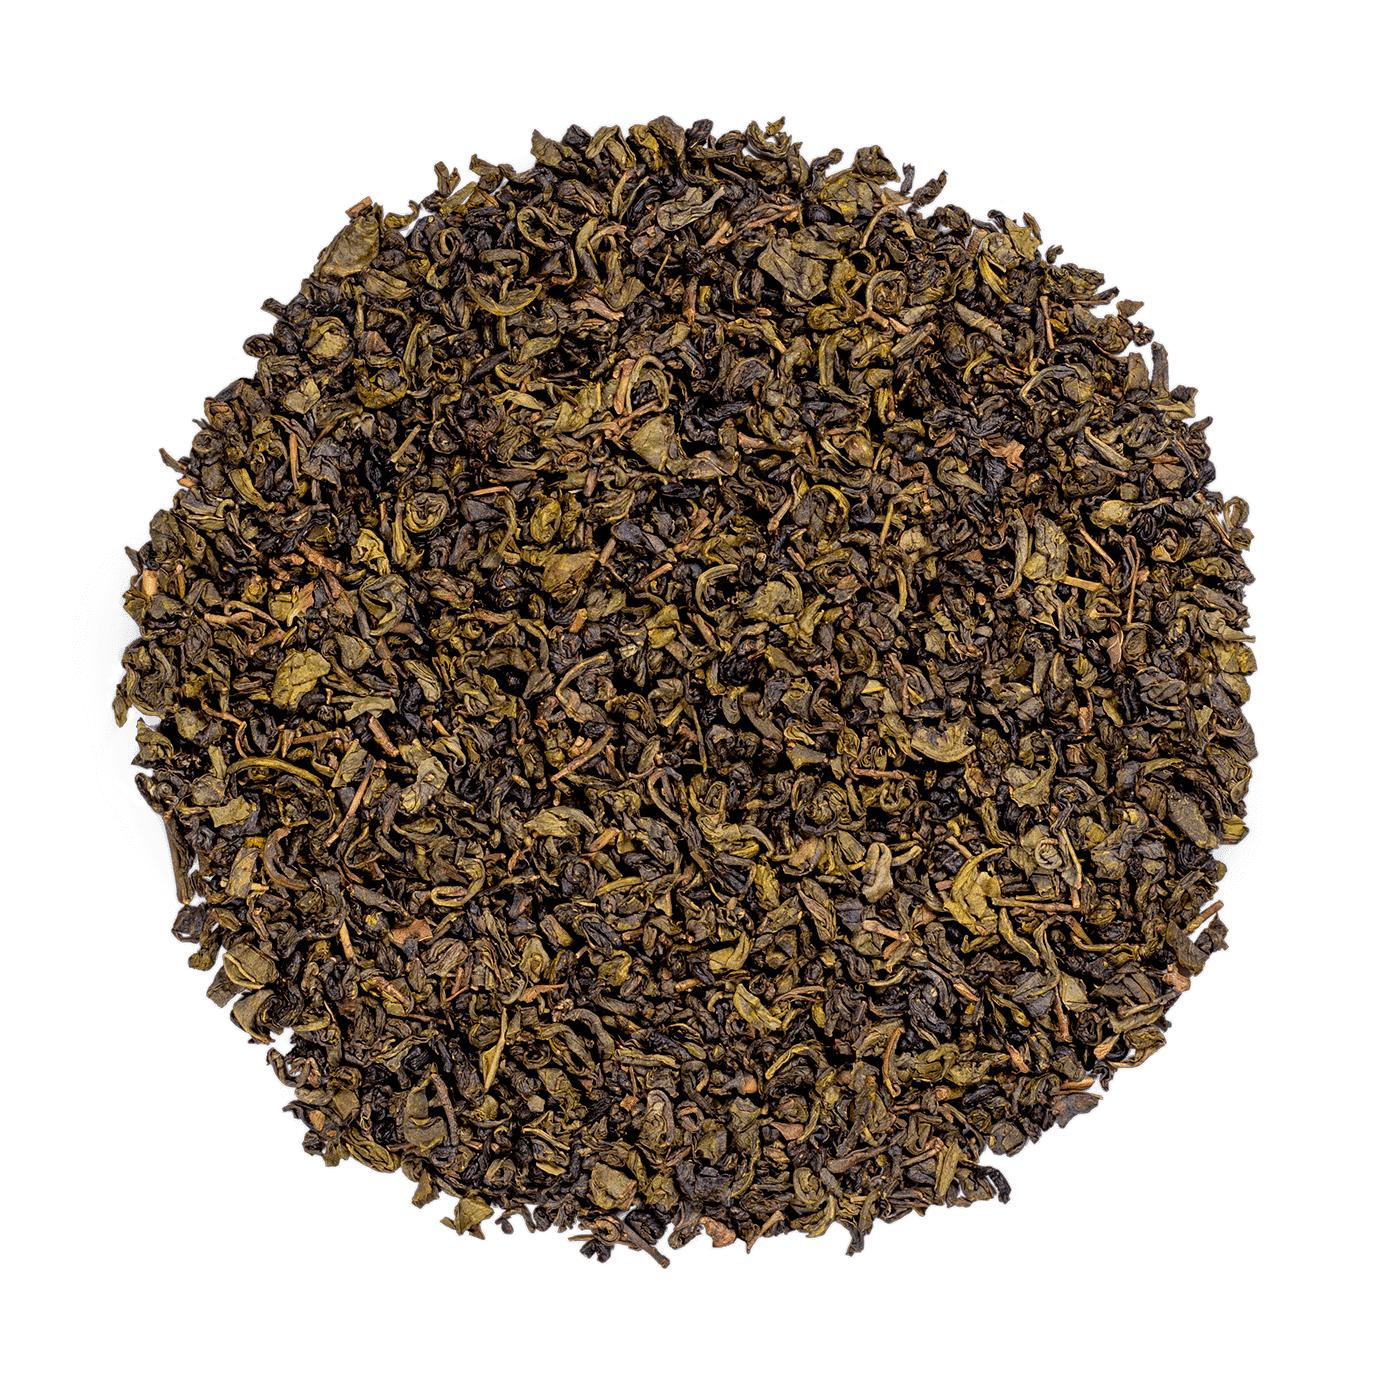 KUSMI TEA Thé vert à la menthe bio - Thé vert à la menthe - Thé en vrac - Kusmi Tea